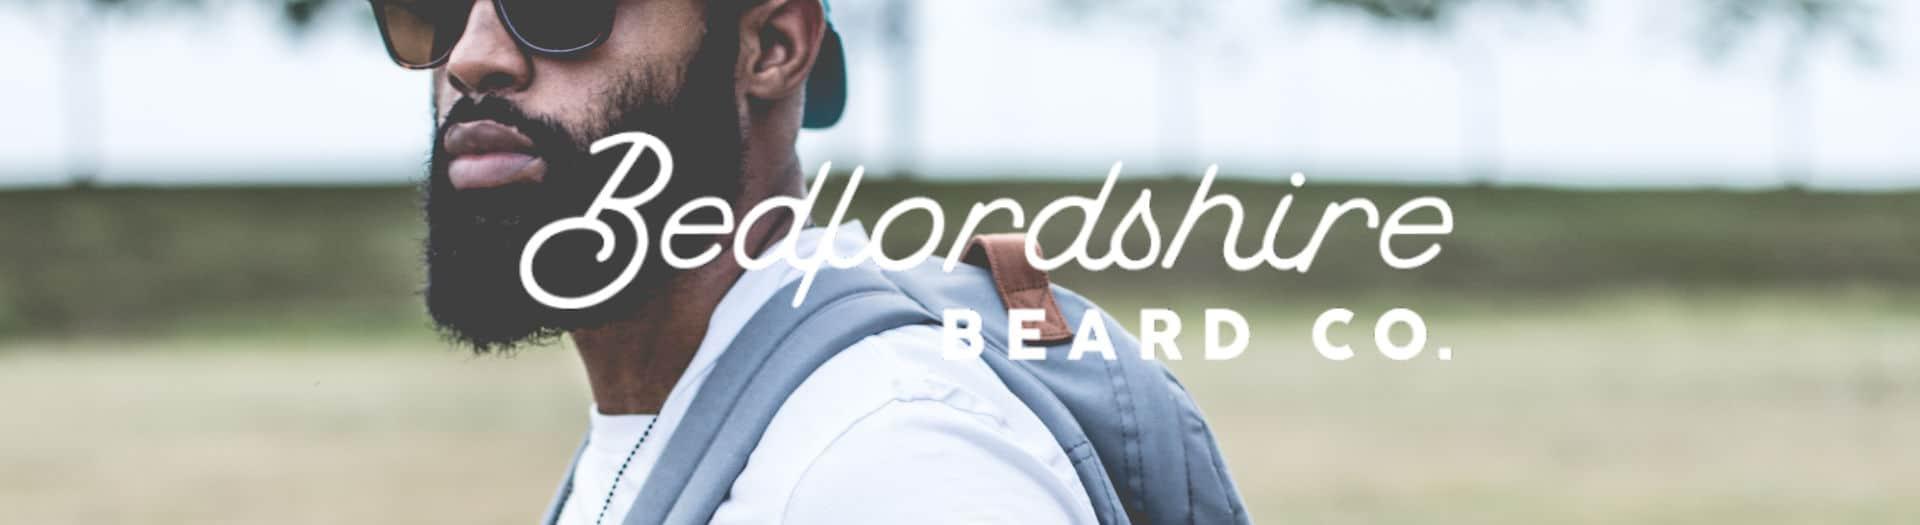 British Made Bedfordshire Beard Co Logo Header